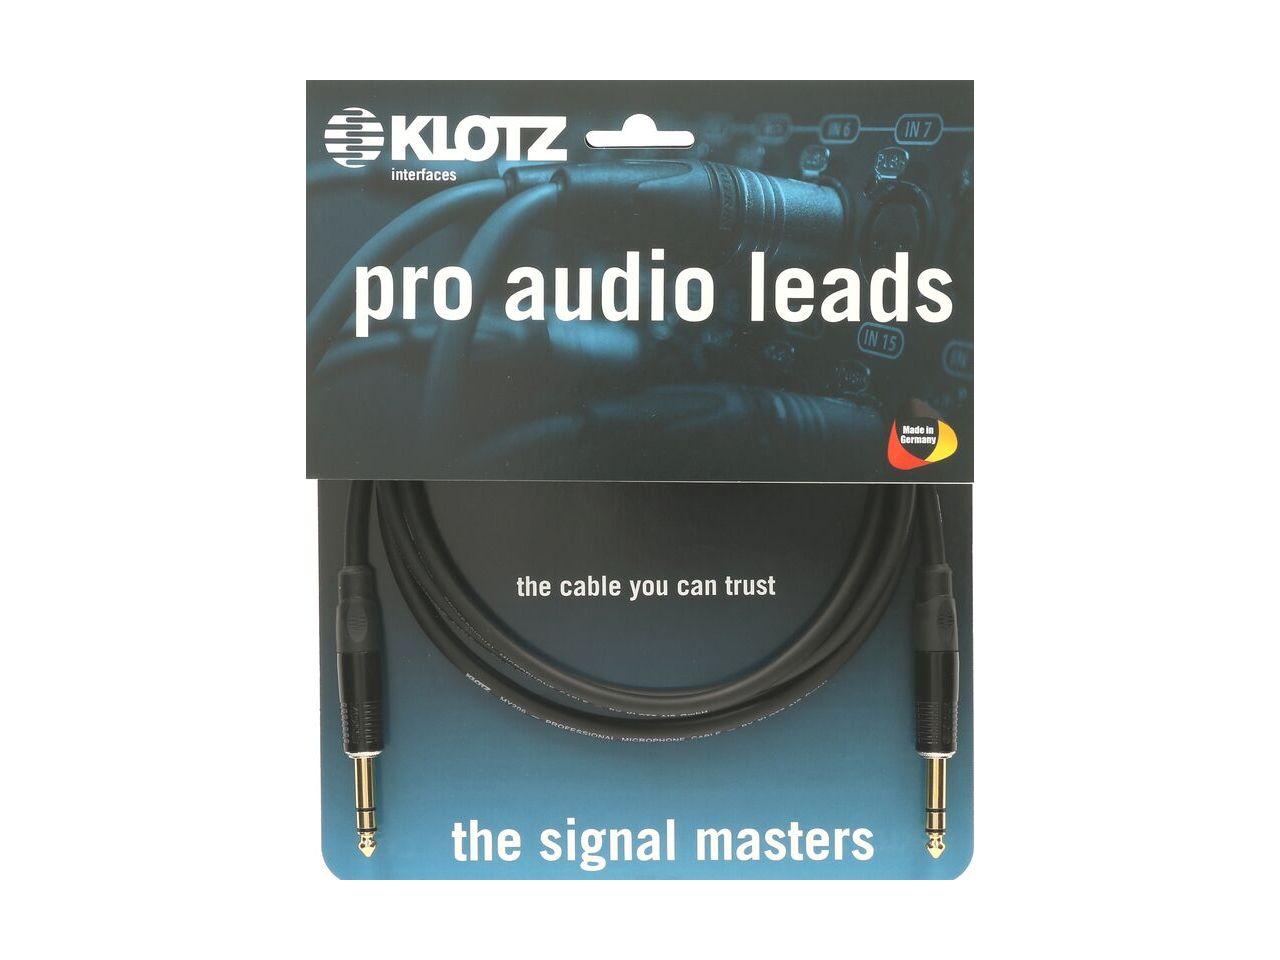 Klotz Kabel 6,3 Klinke Stereo an 6,3 Klinke Stereo 3m